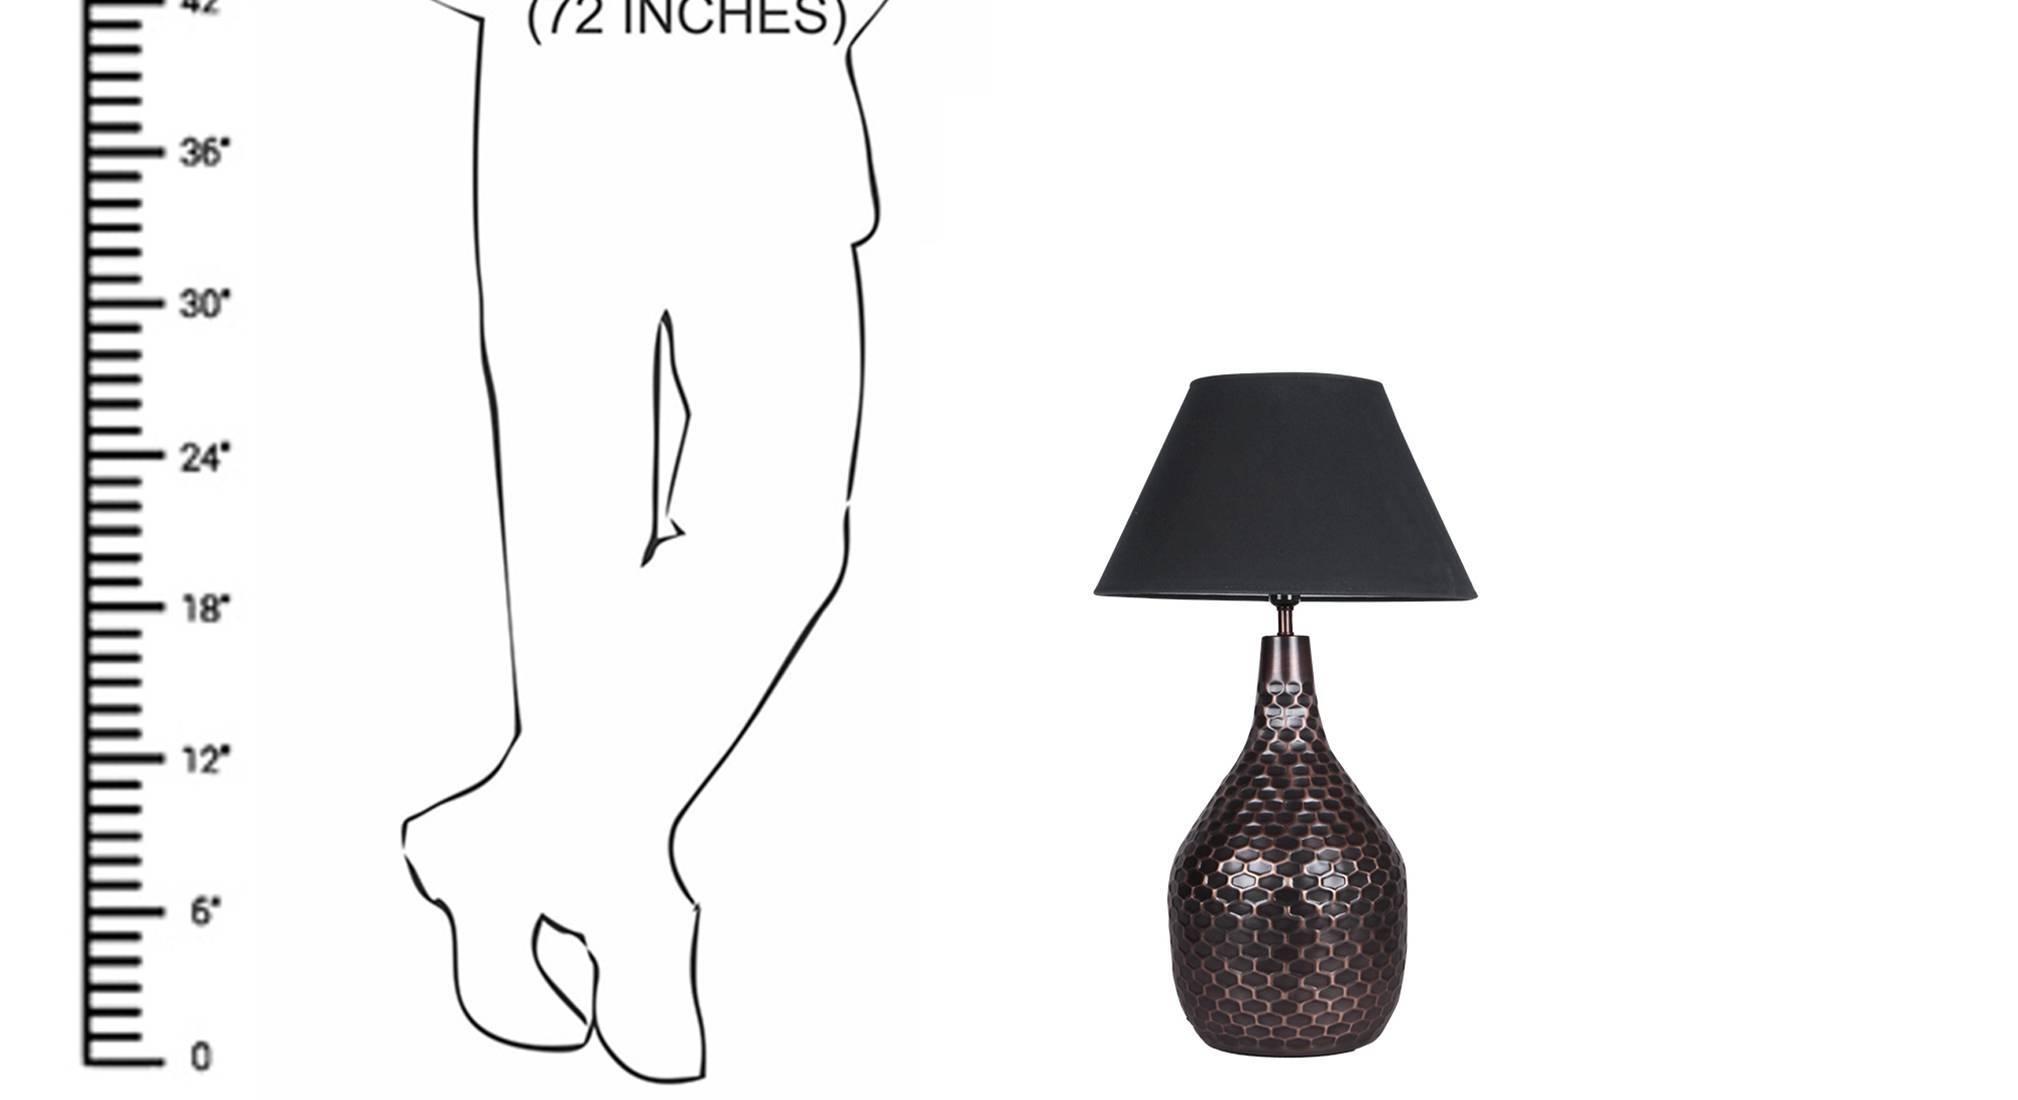 Hexapat table lamp 6